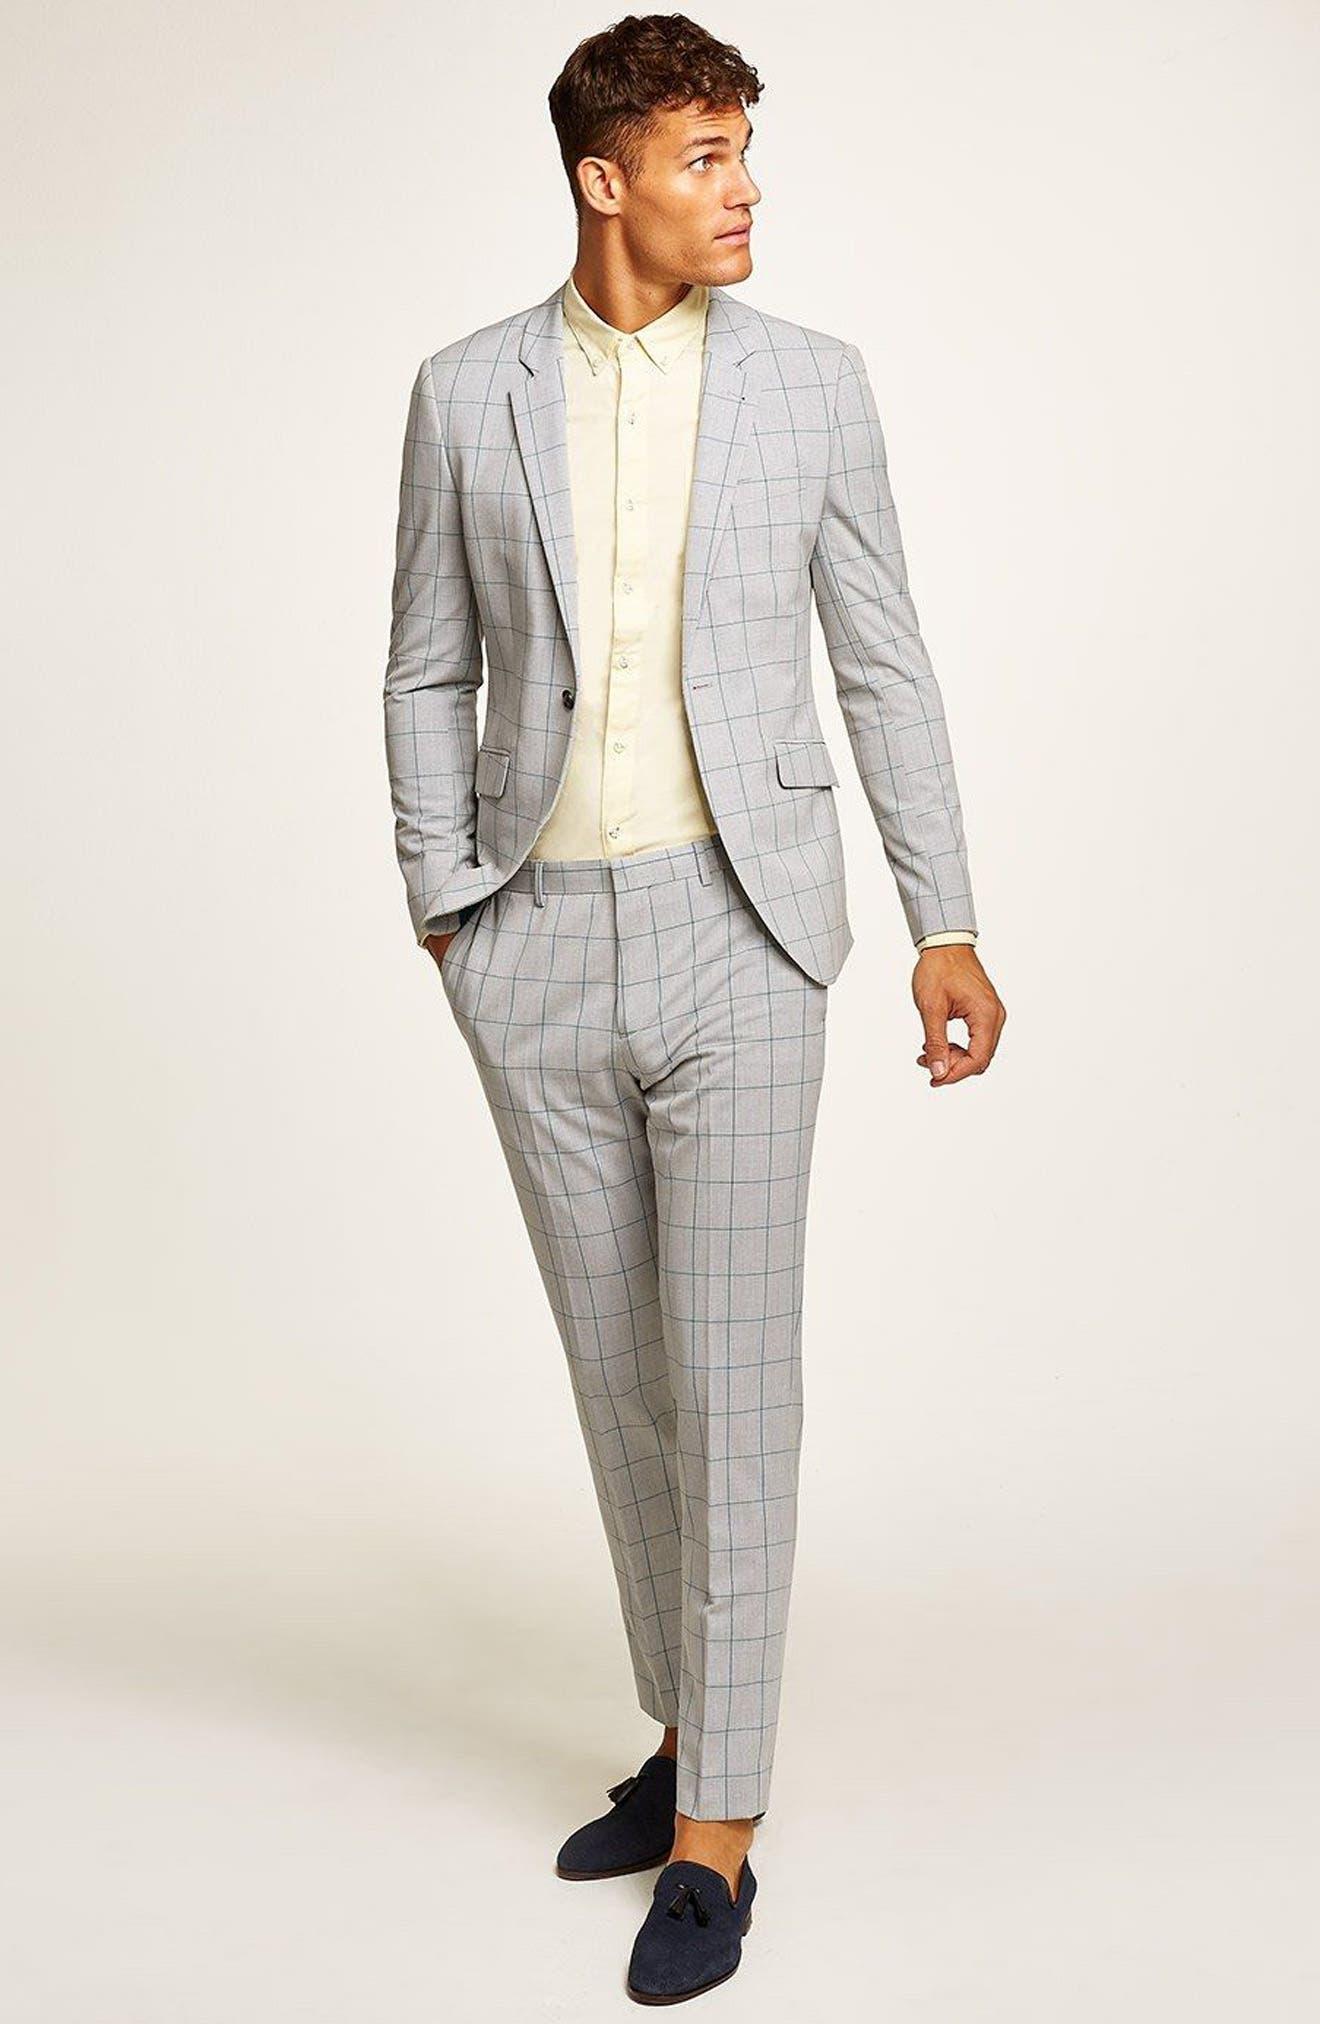 TOPMAN, Muscle Fit Check Suit Trousers, Alternate thumbnail 5, color, 300